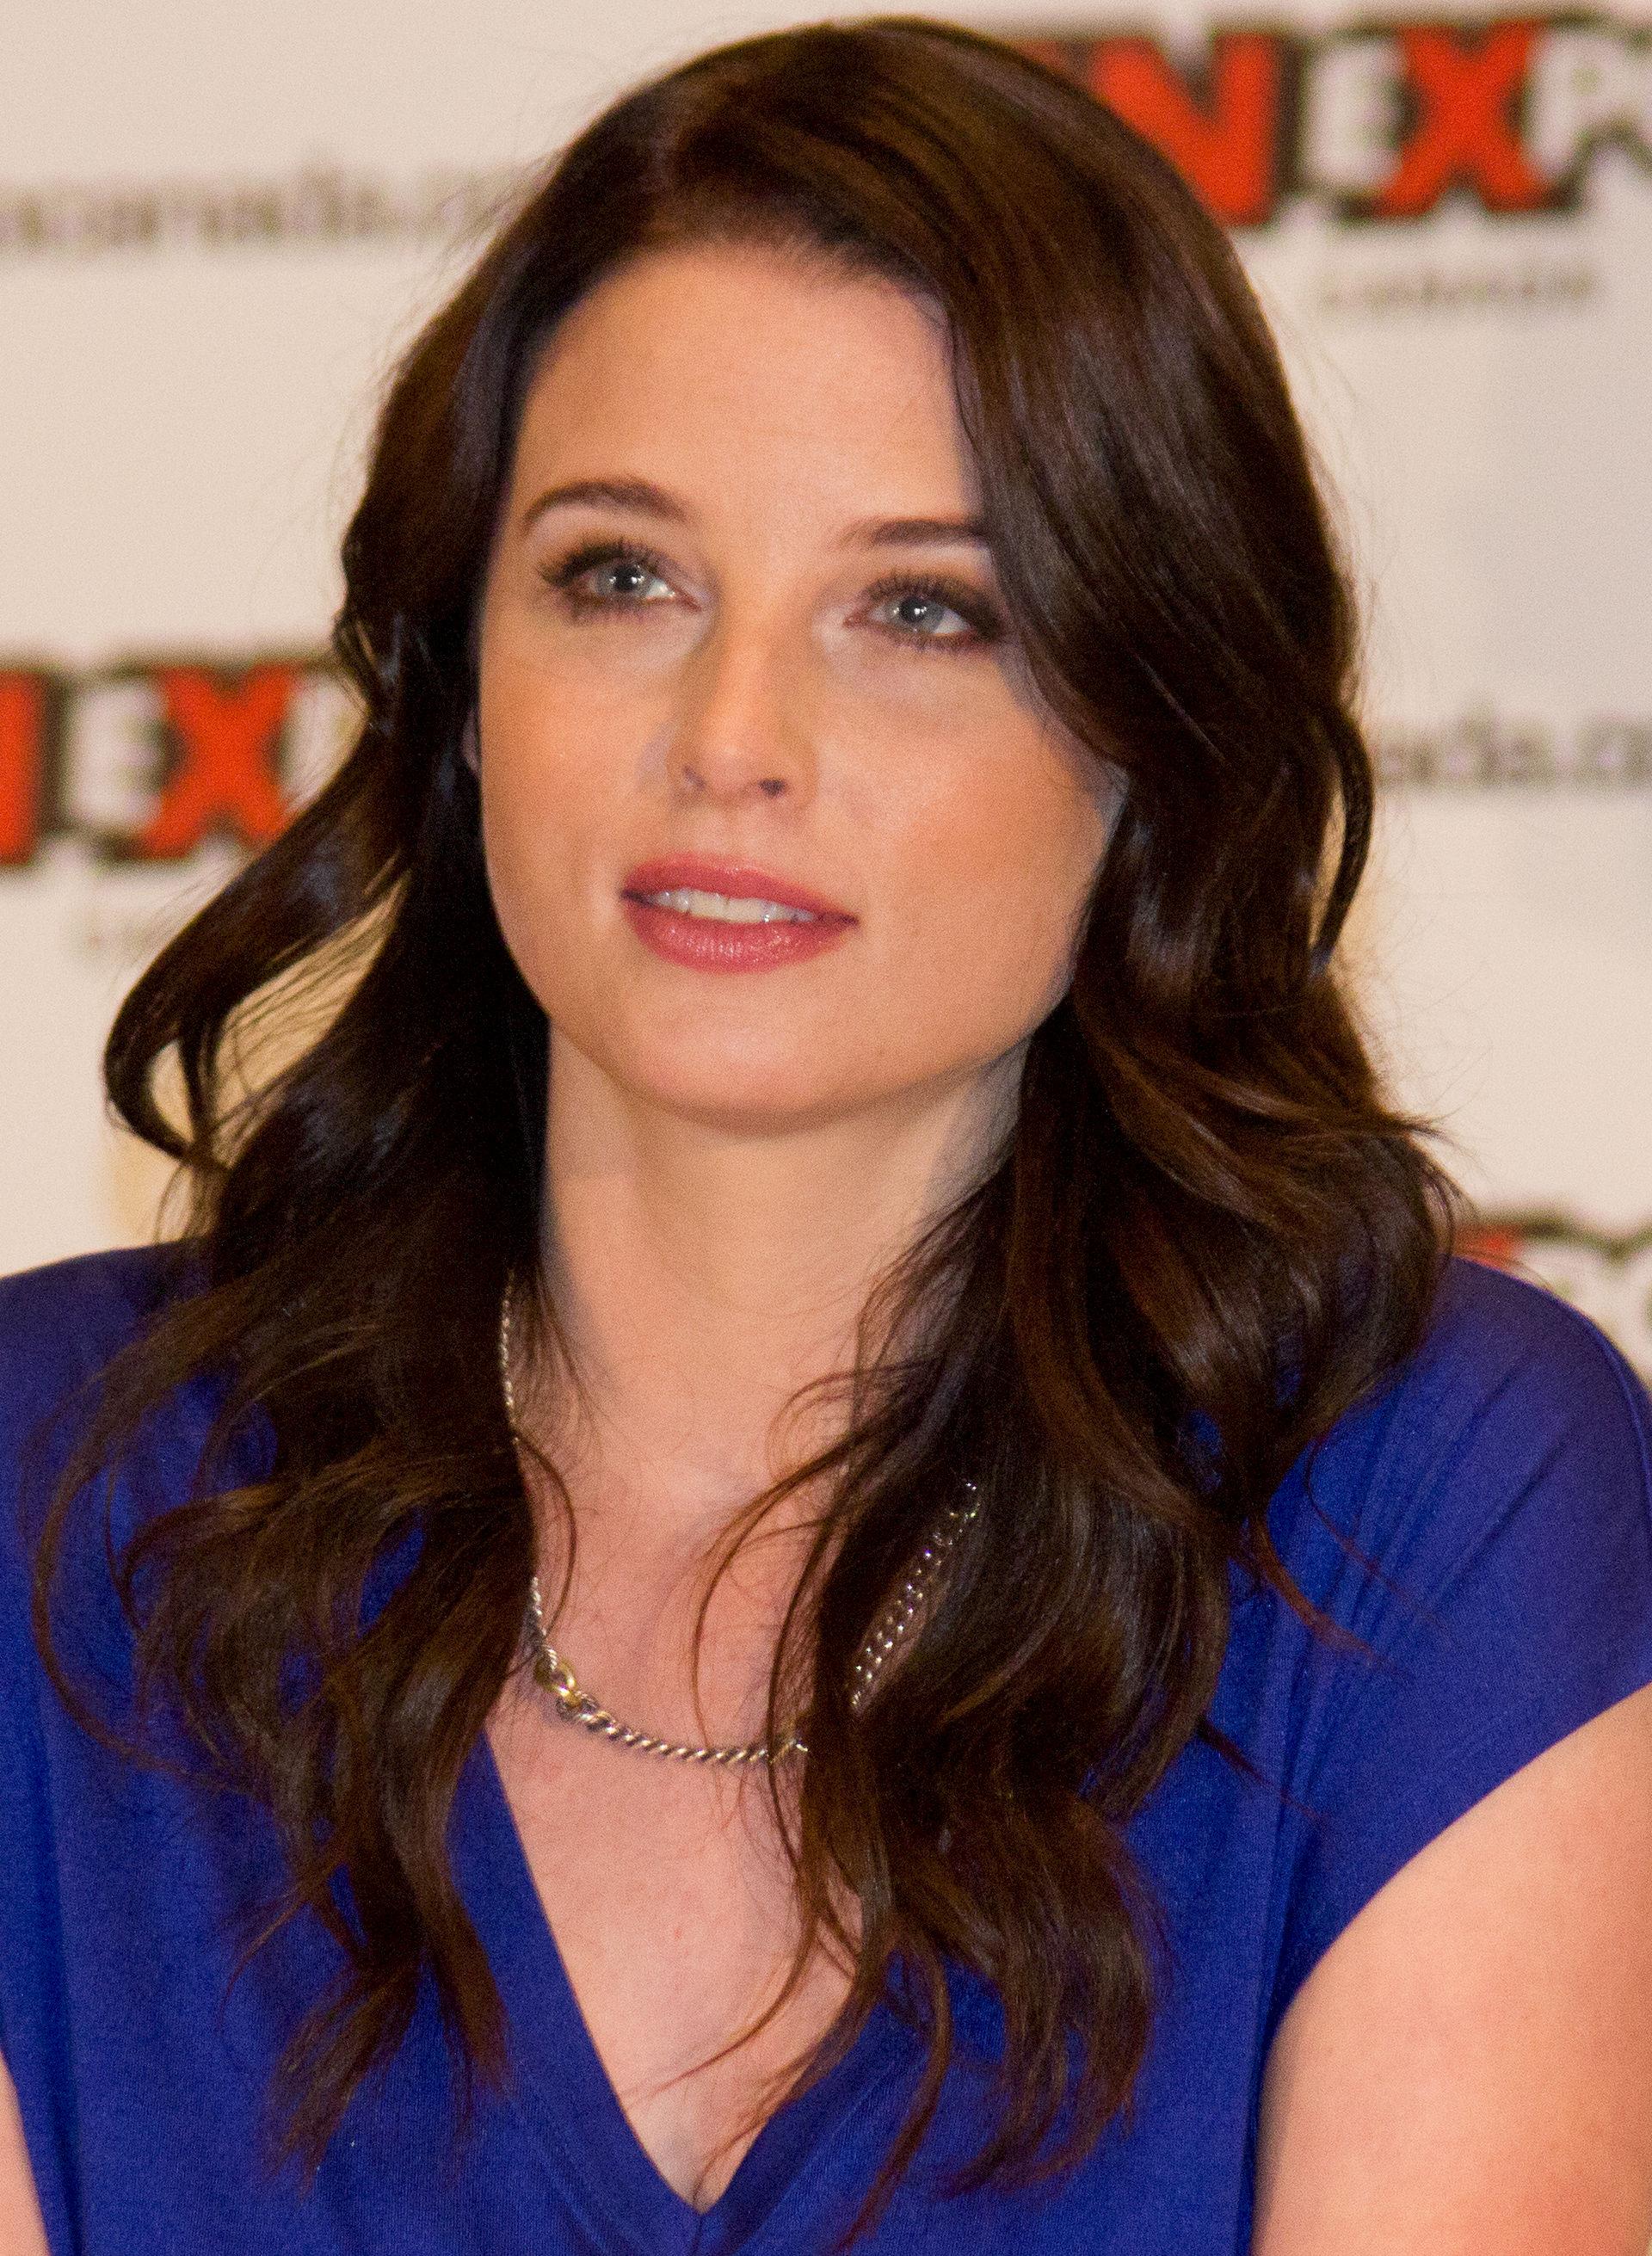 Photo of Rachel Nichols (actress): American actress and model